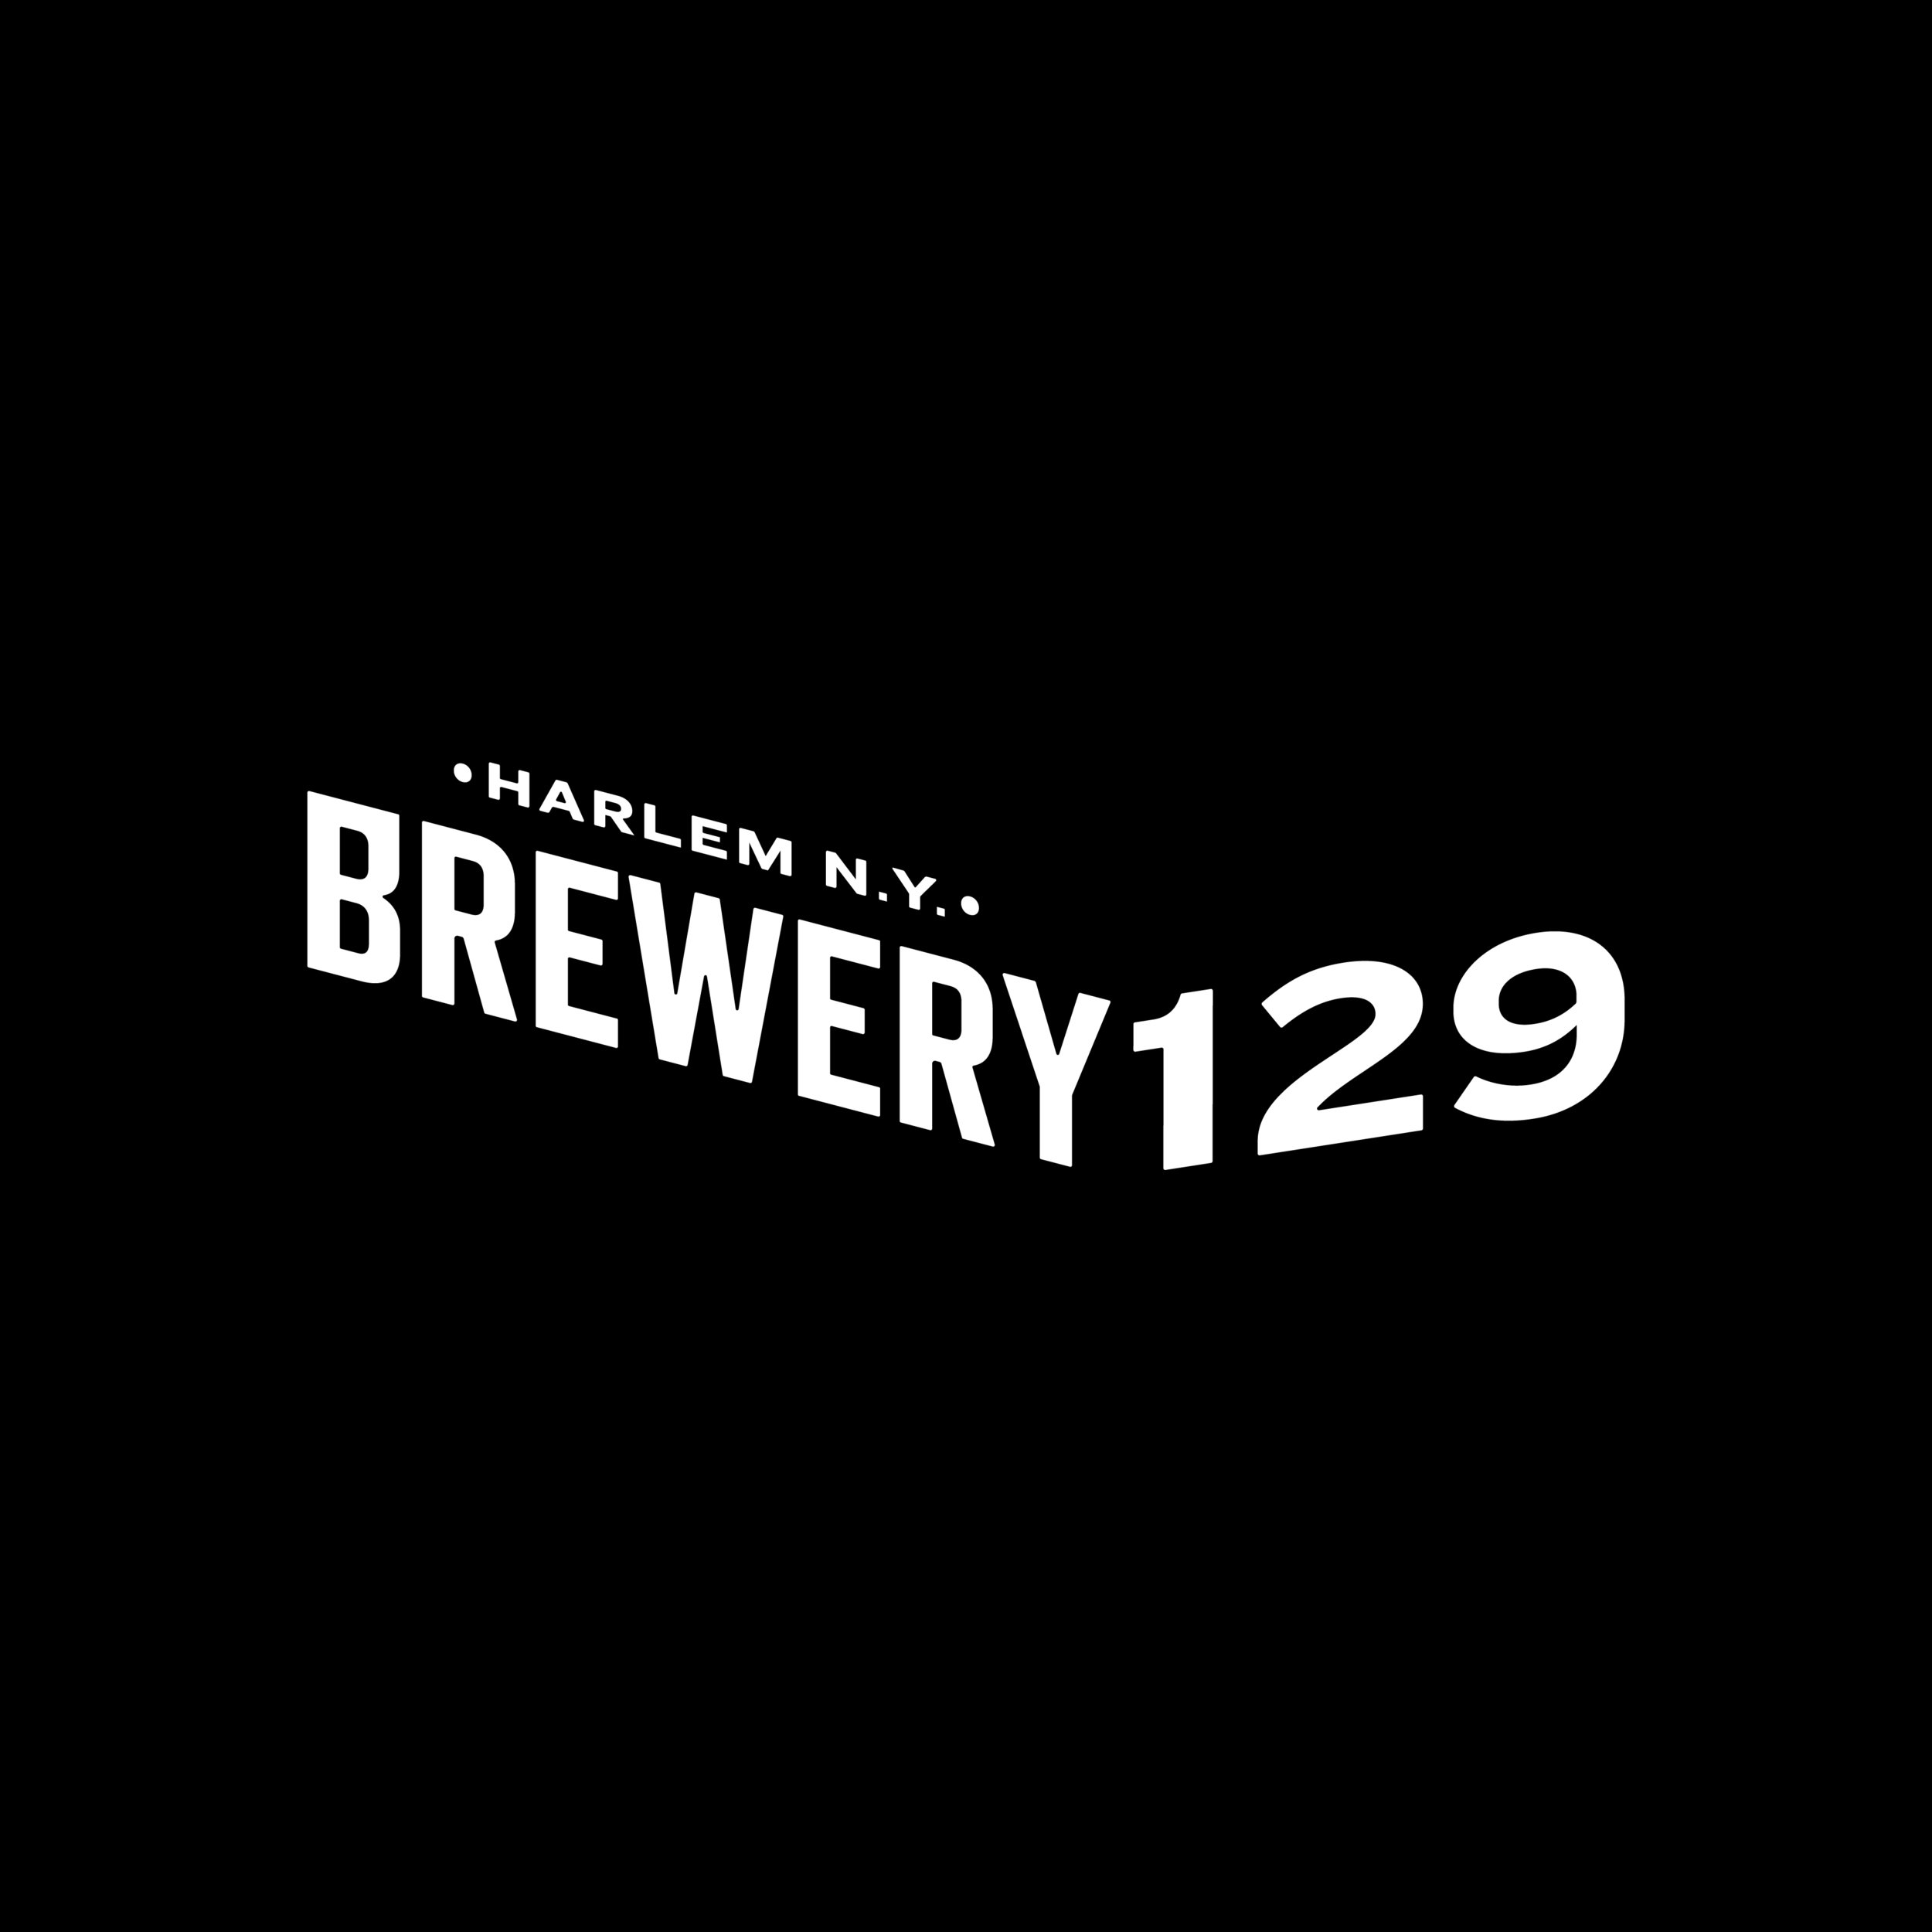 Brewery129 Logos-04.jpg